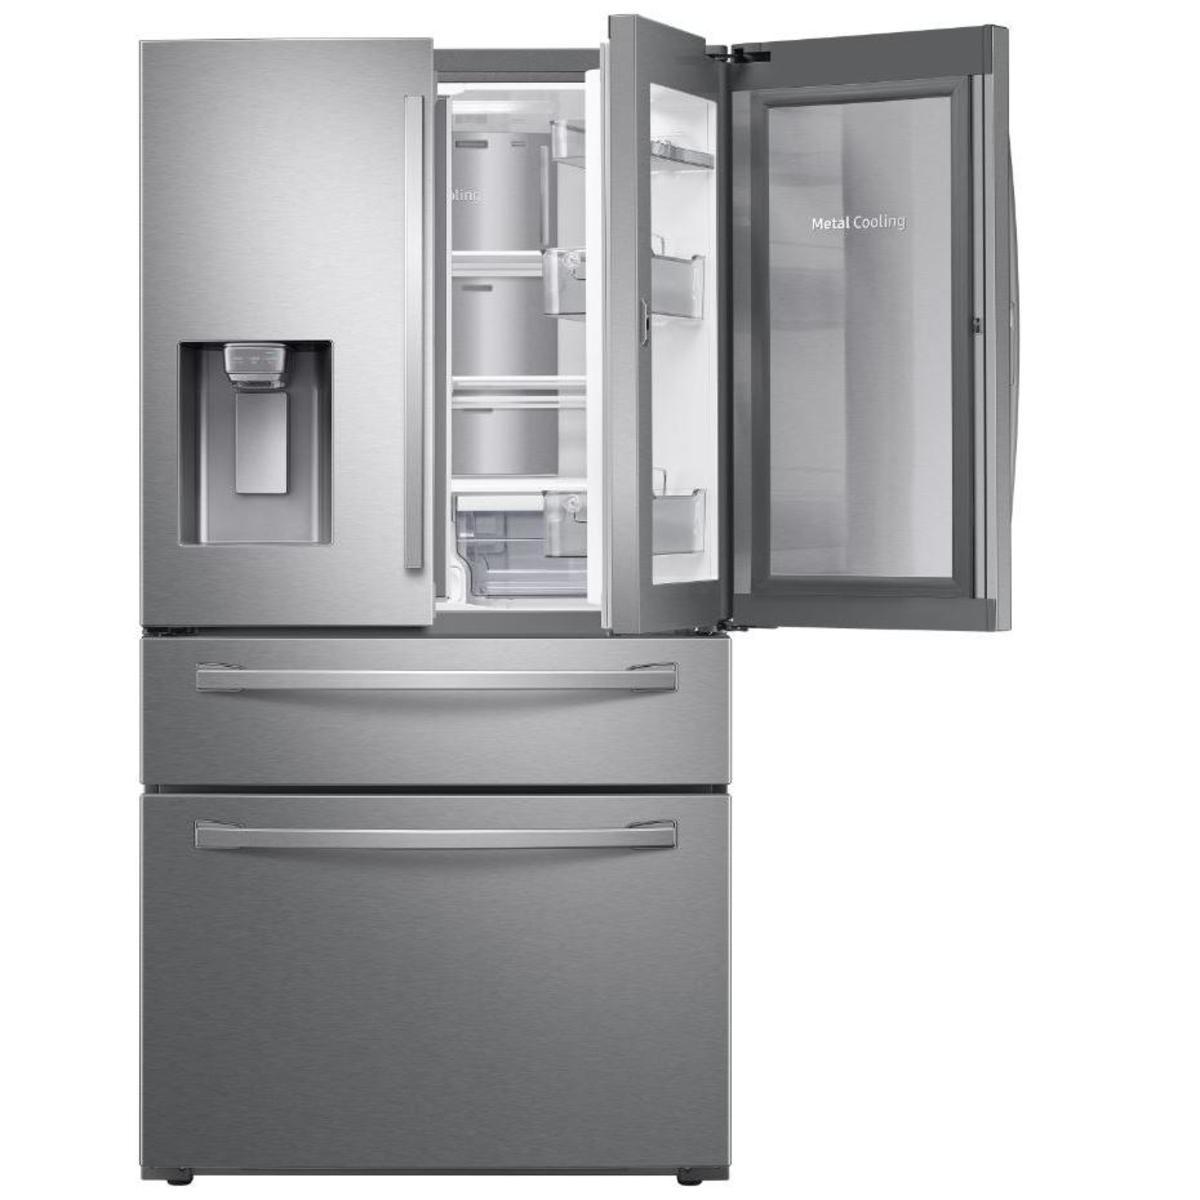 Samsung RF22R7351SR AW4 French Door Fridge Freezer, Real Stainless